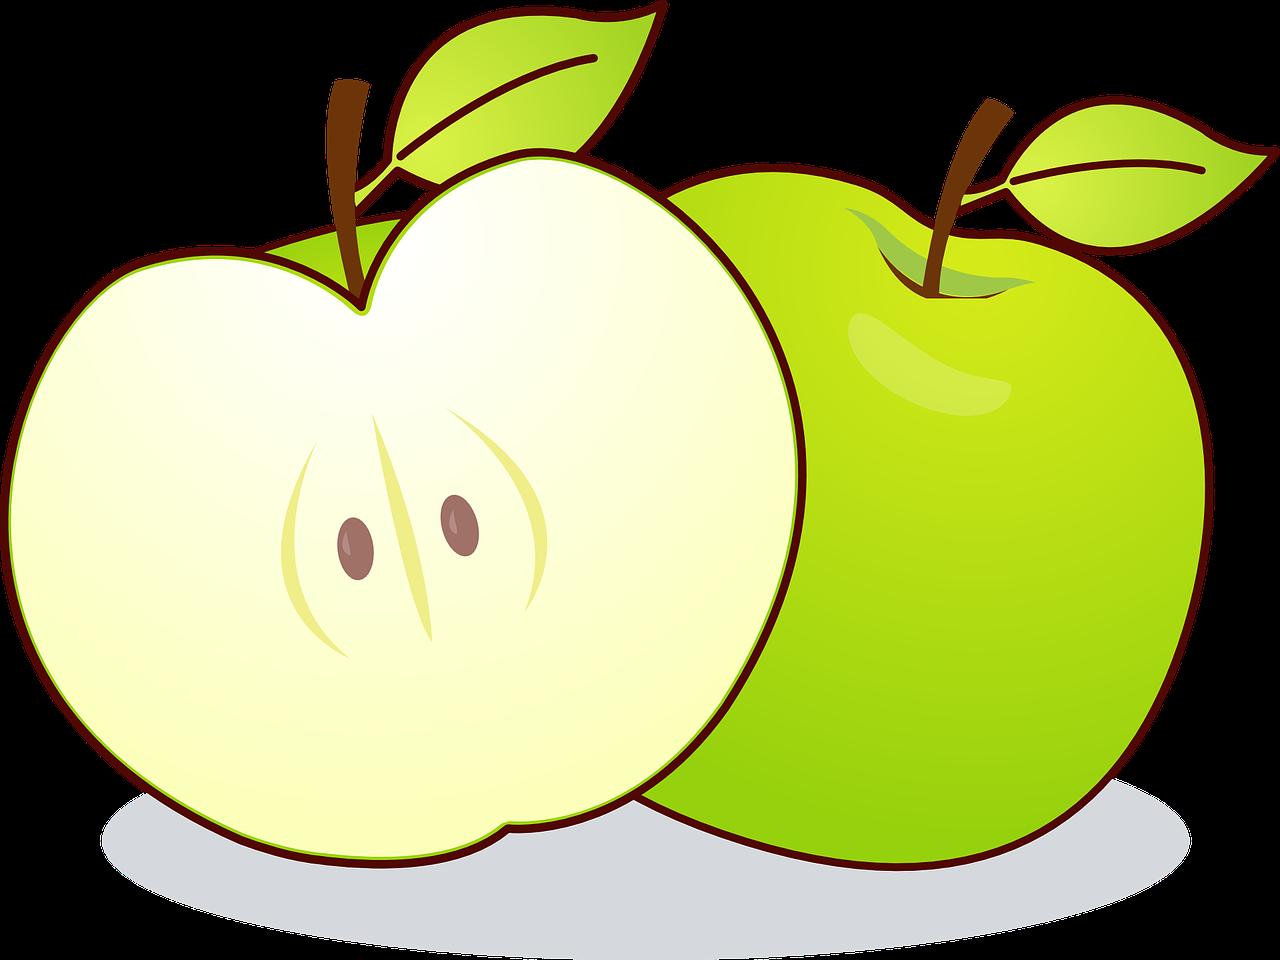 Apple(企業)